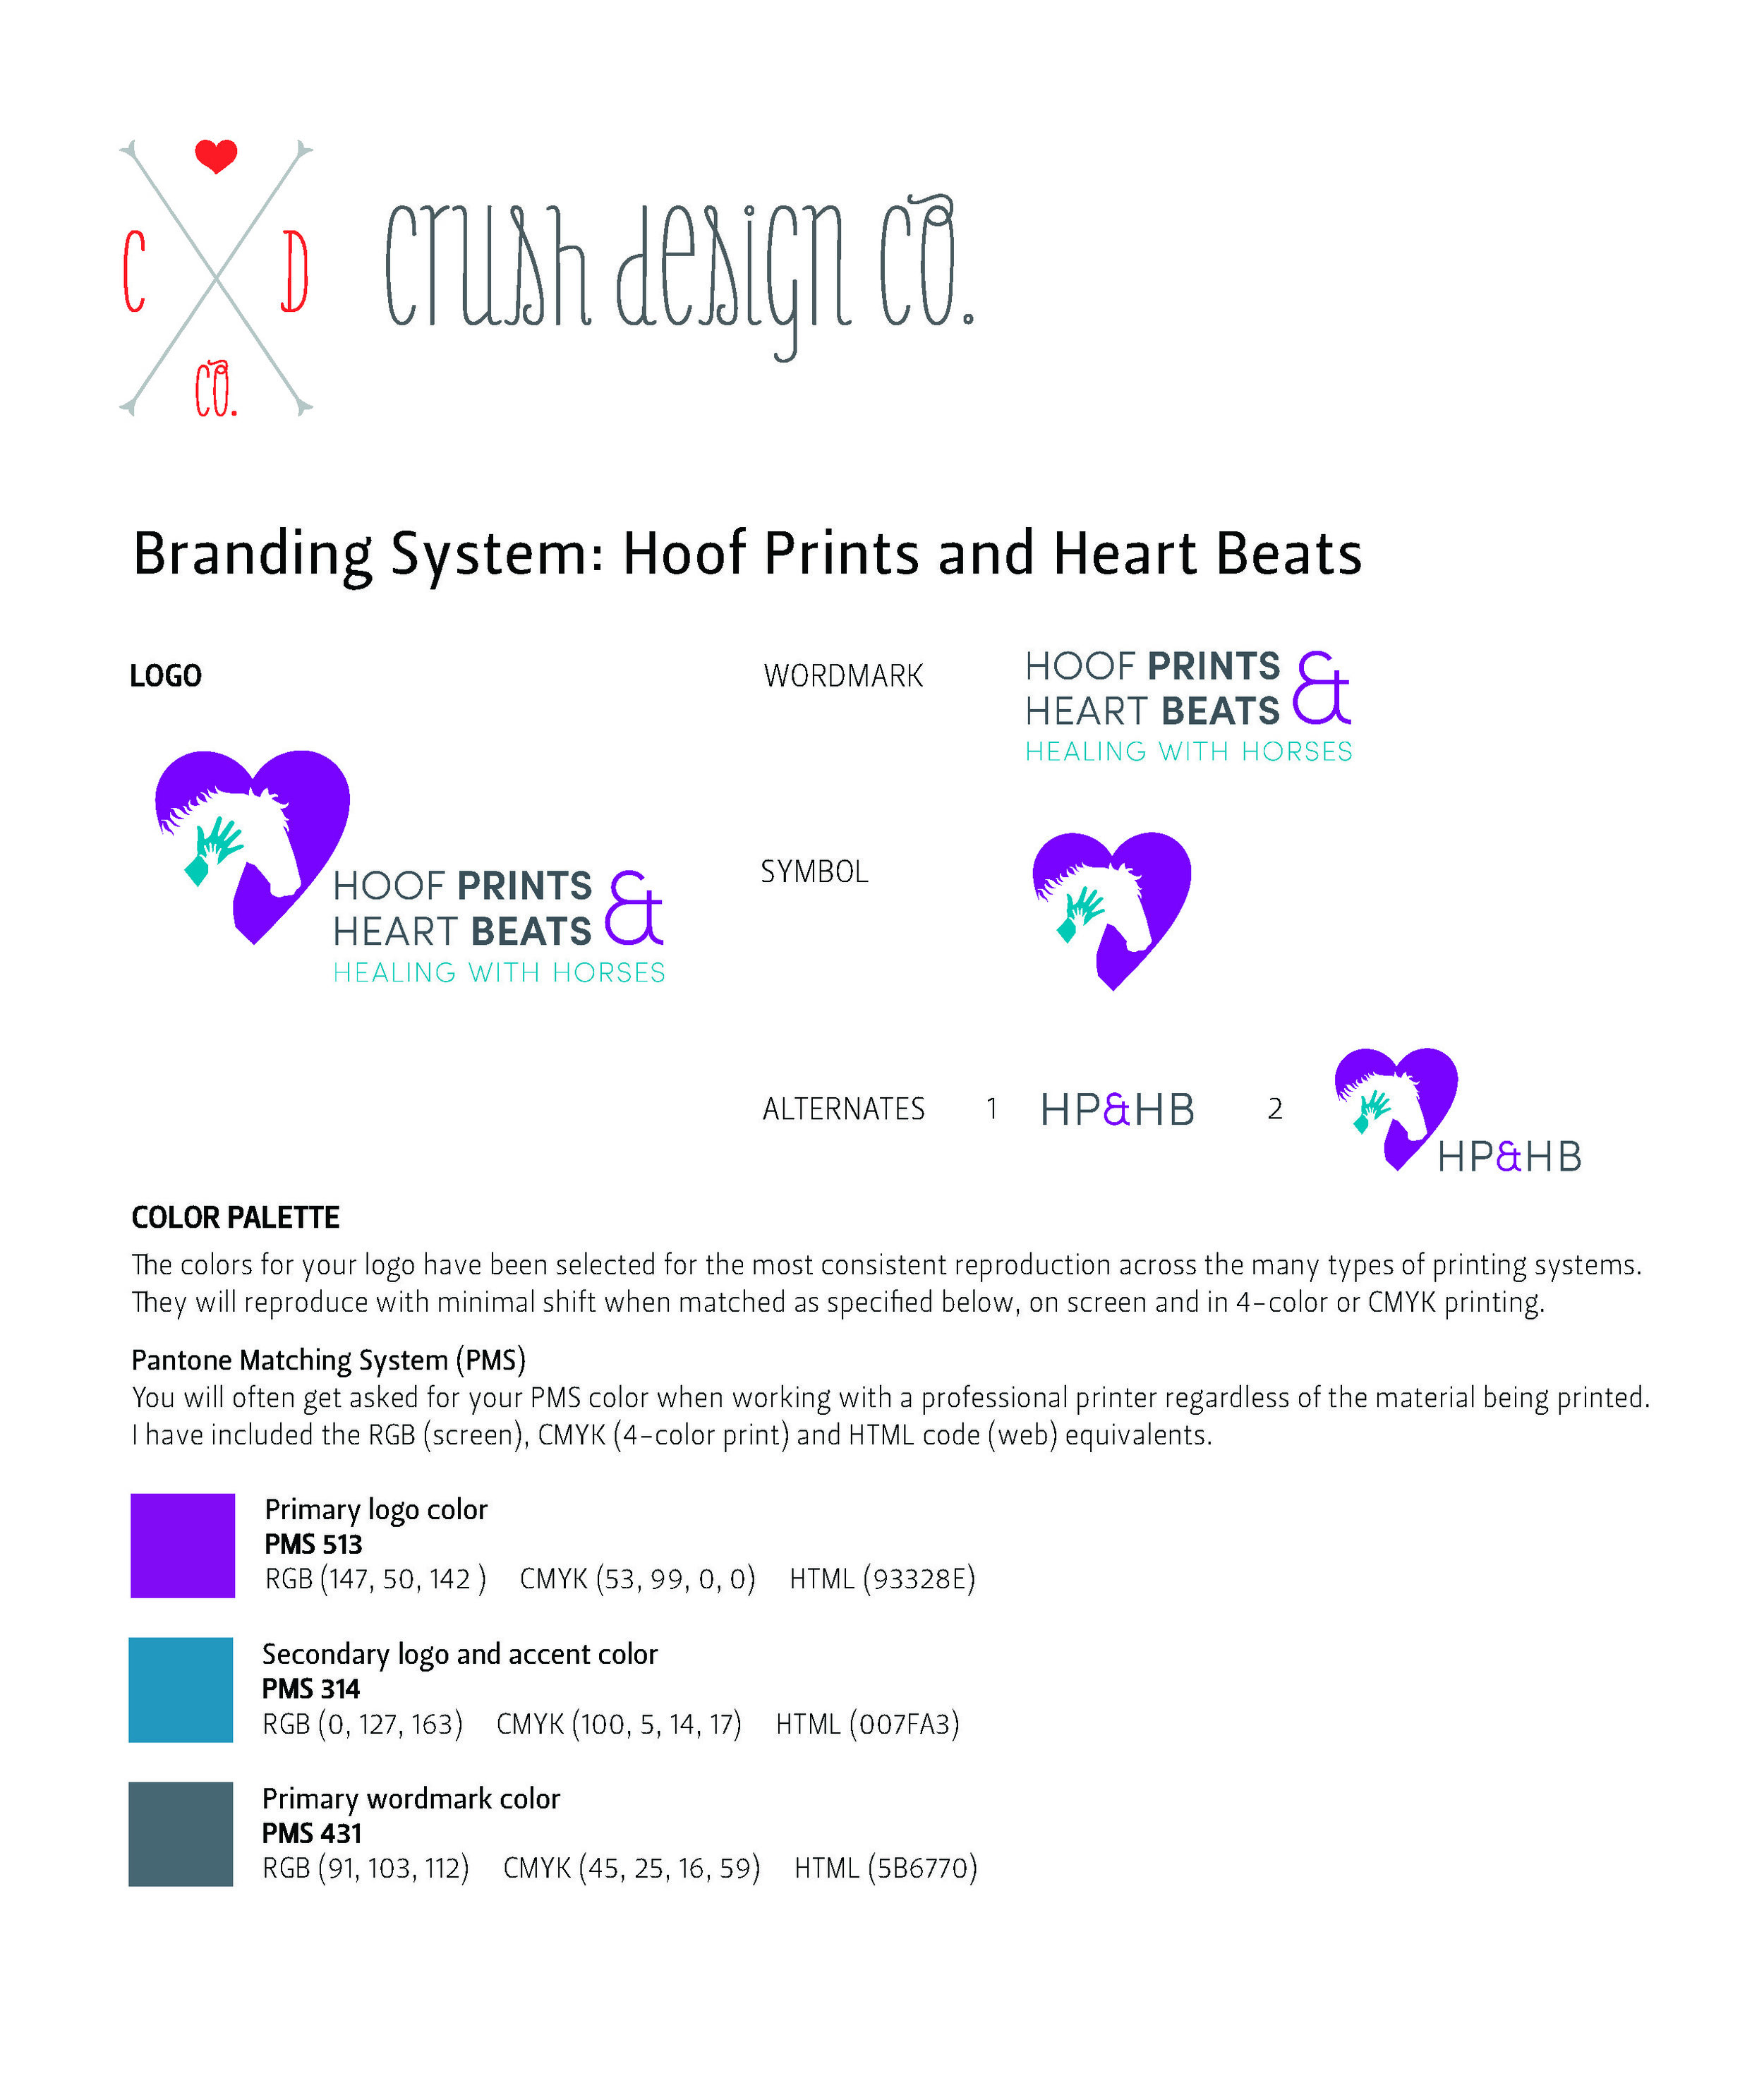 1 HPHB-BrandingSystemSummary.jpg